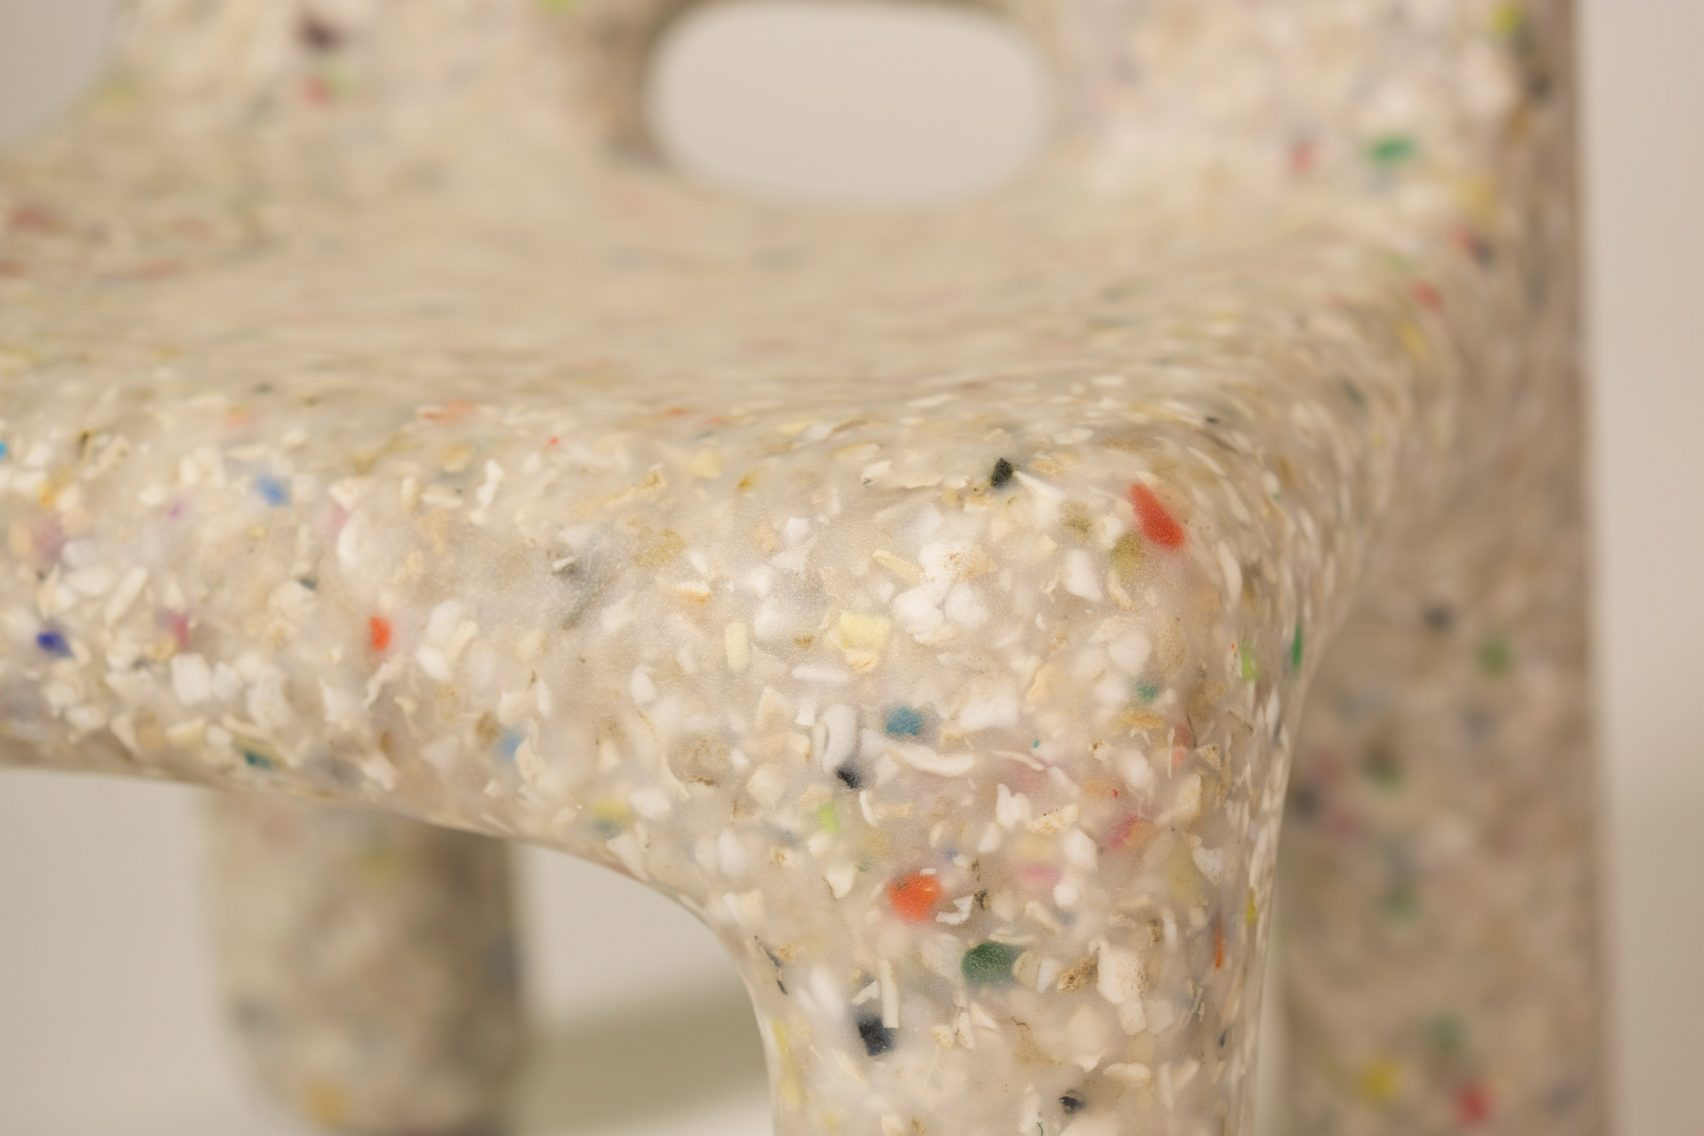 ecobirdy-childrens-furniture-design-maison-objet-recycled-plastic_dezeen_2364_col_0-1704x1136